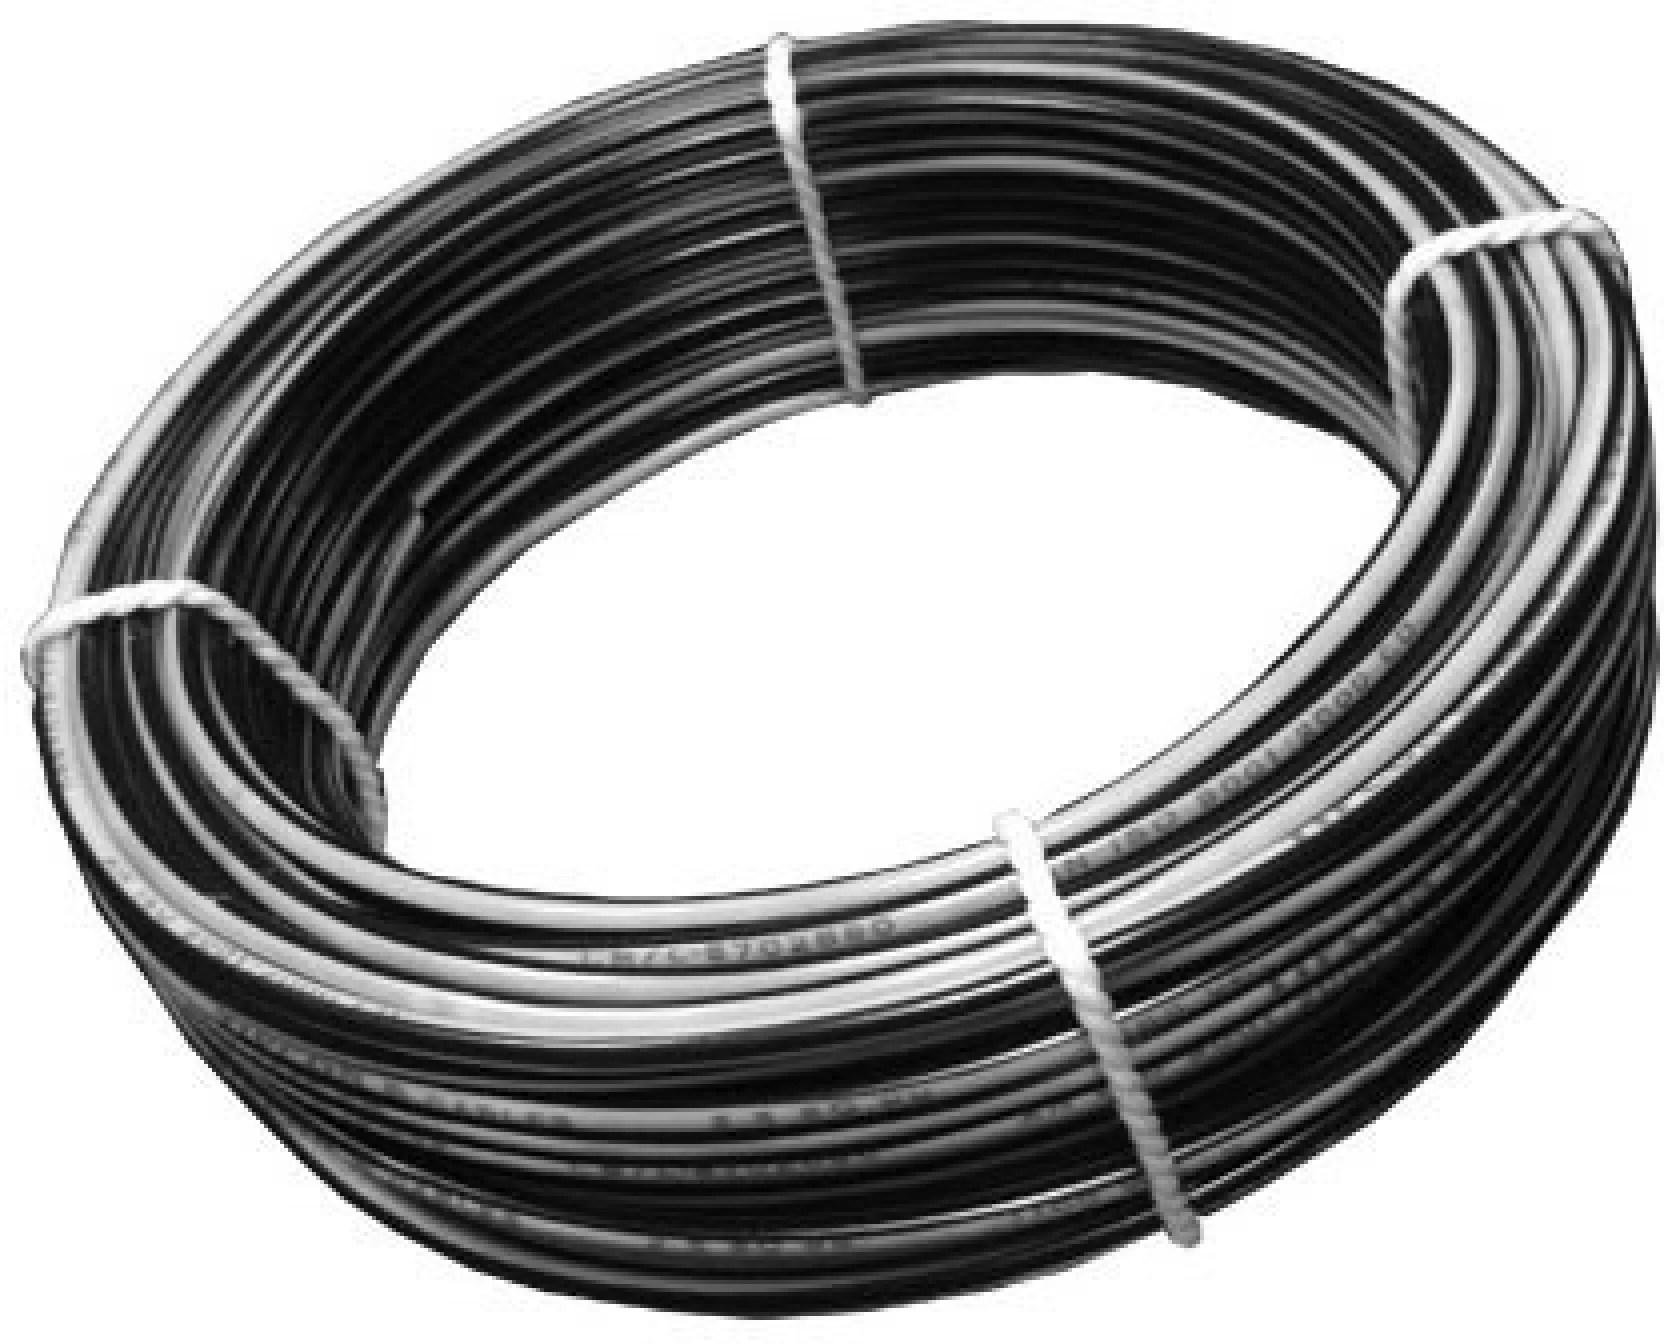 hight resolution of tipcon fr 2 5 sq mm black 30 m wire black